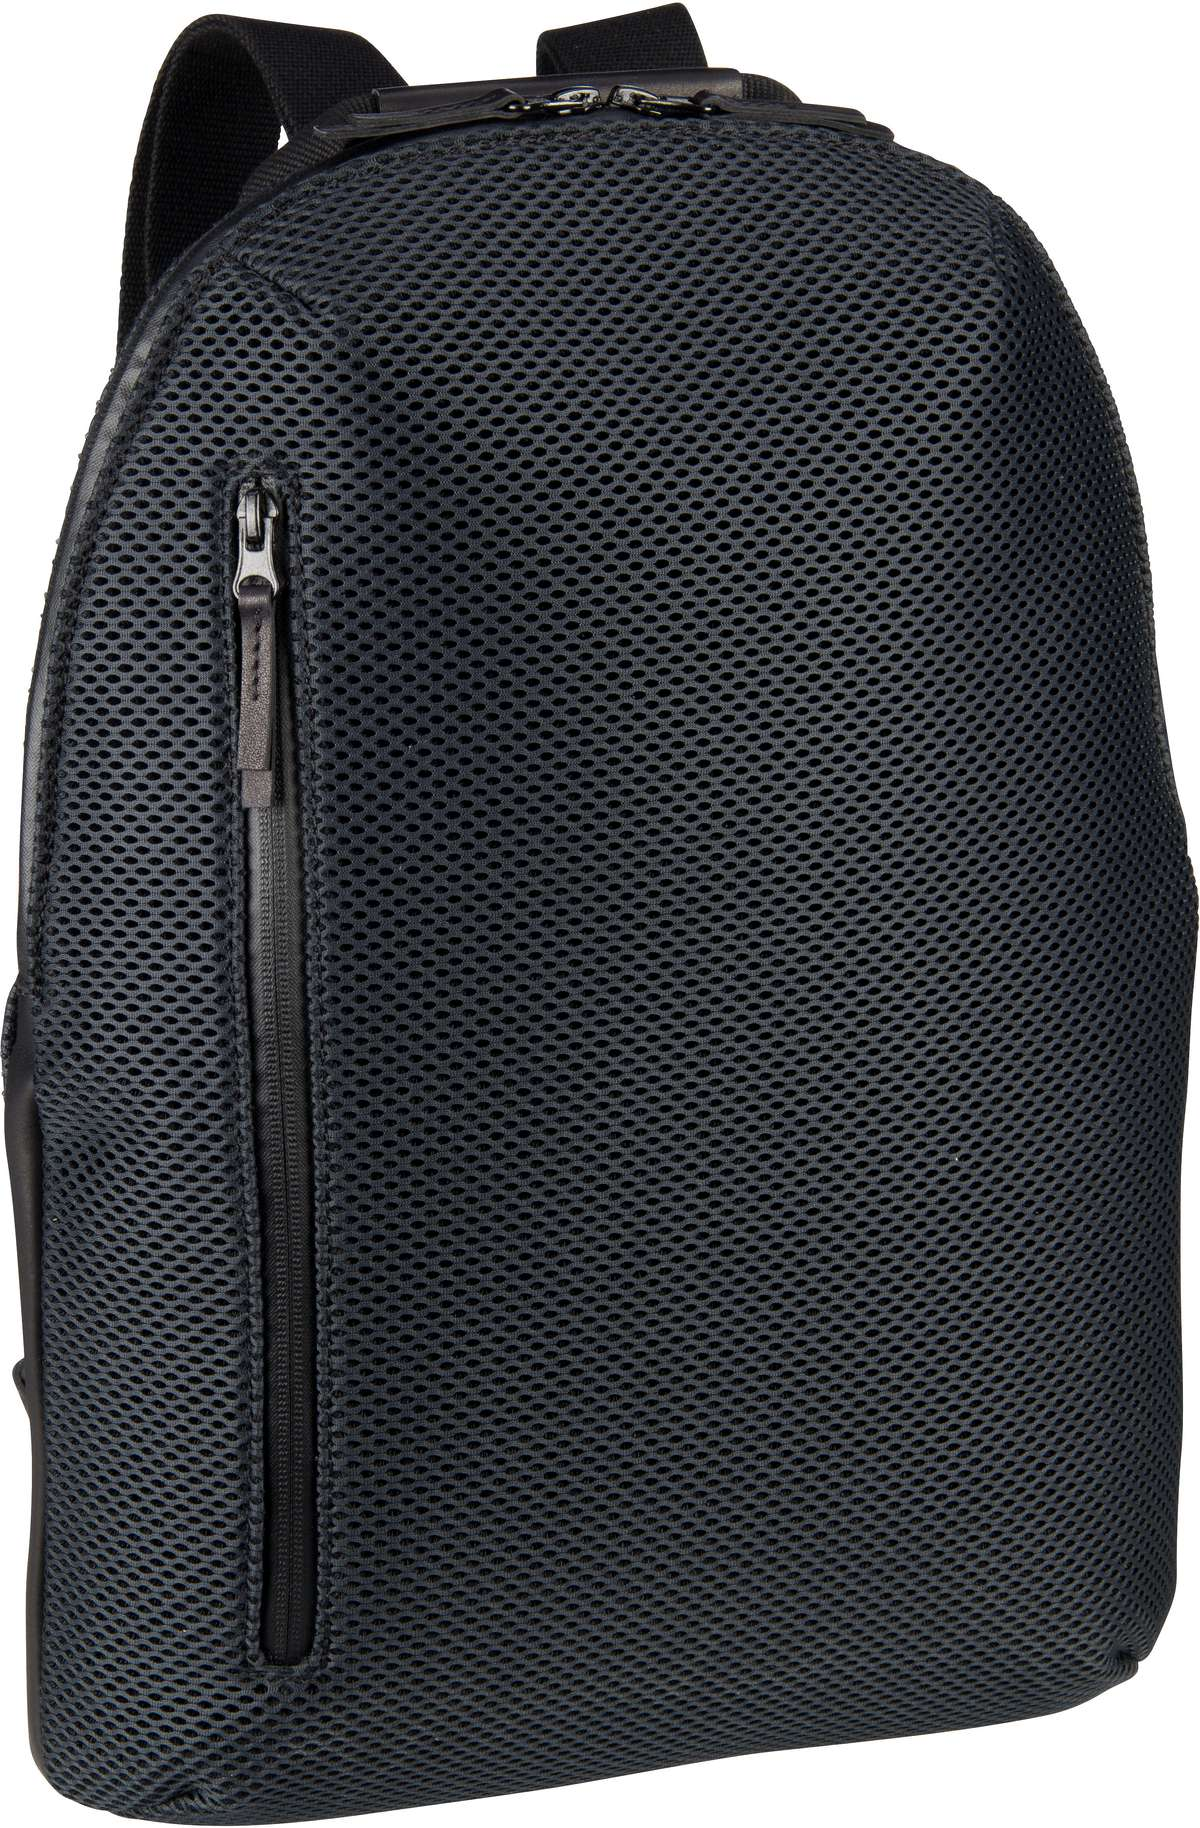 Rucksack / Daypack Mesh 6188 Daypack Black